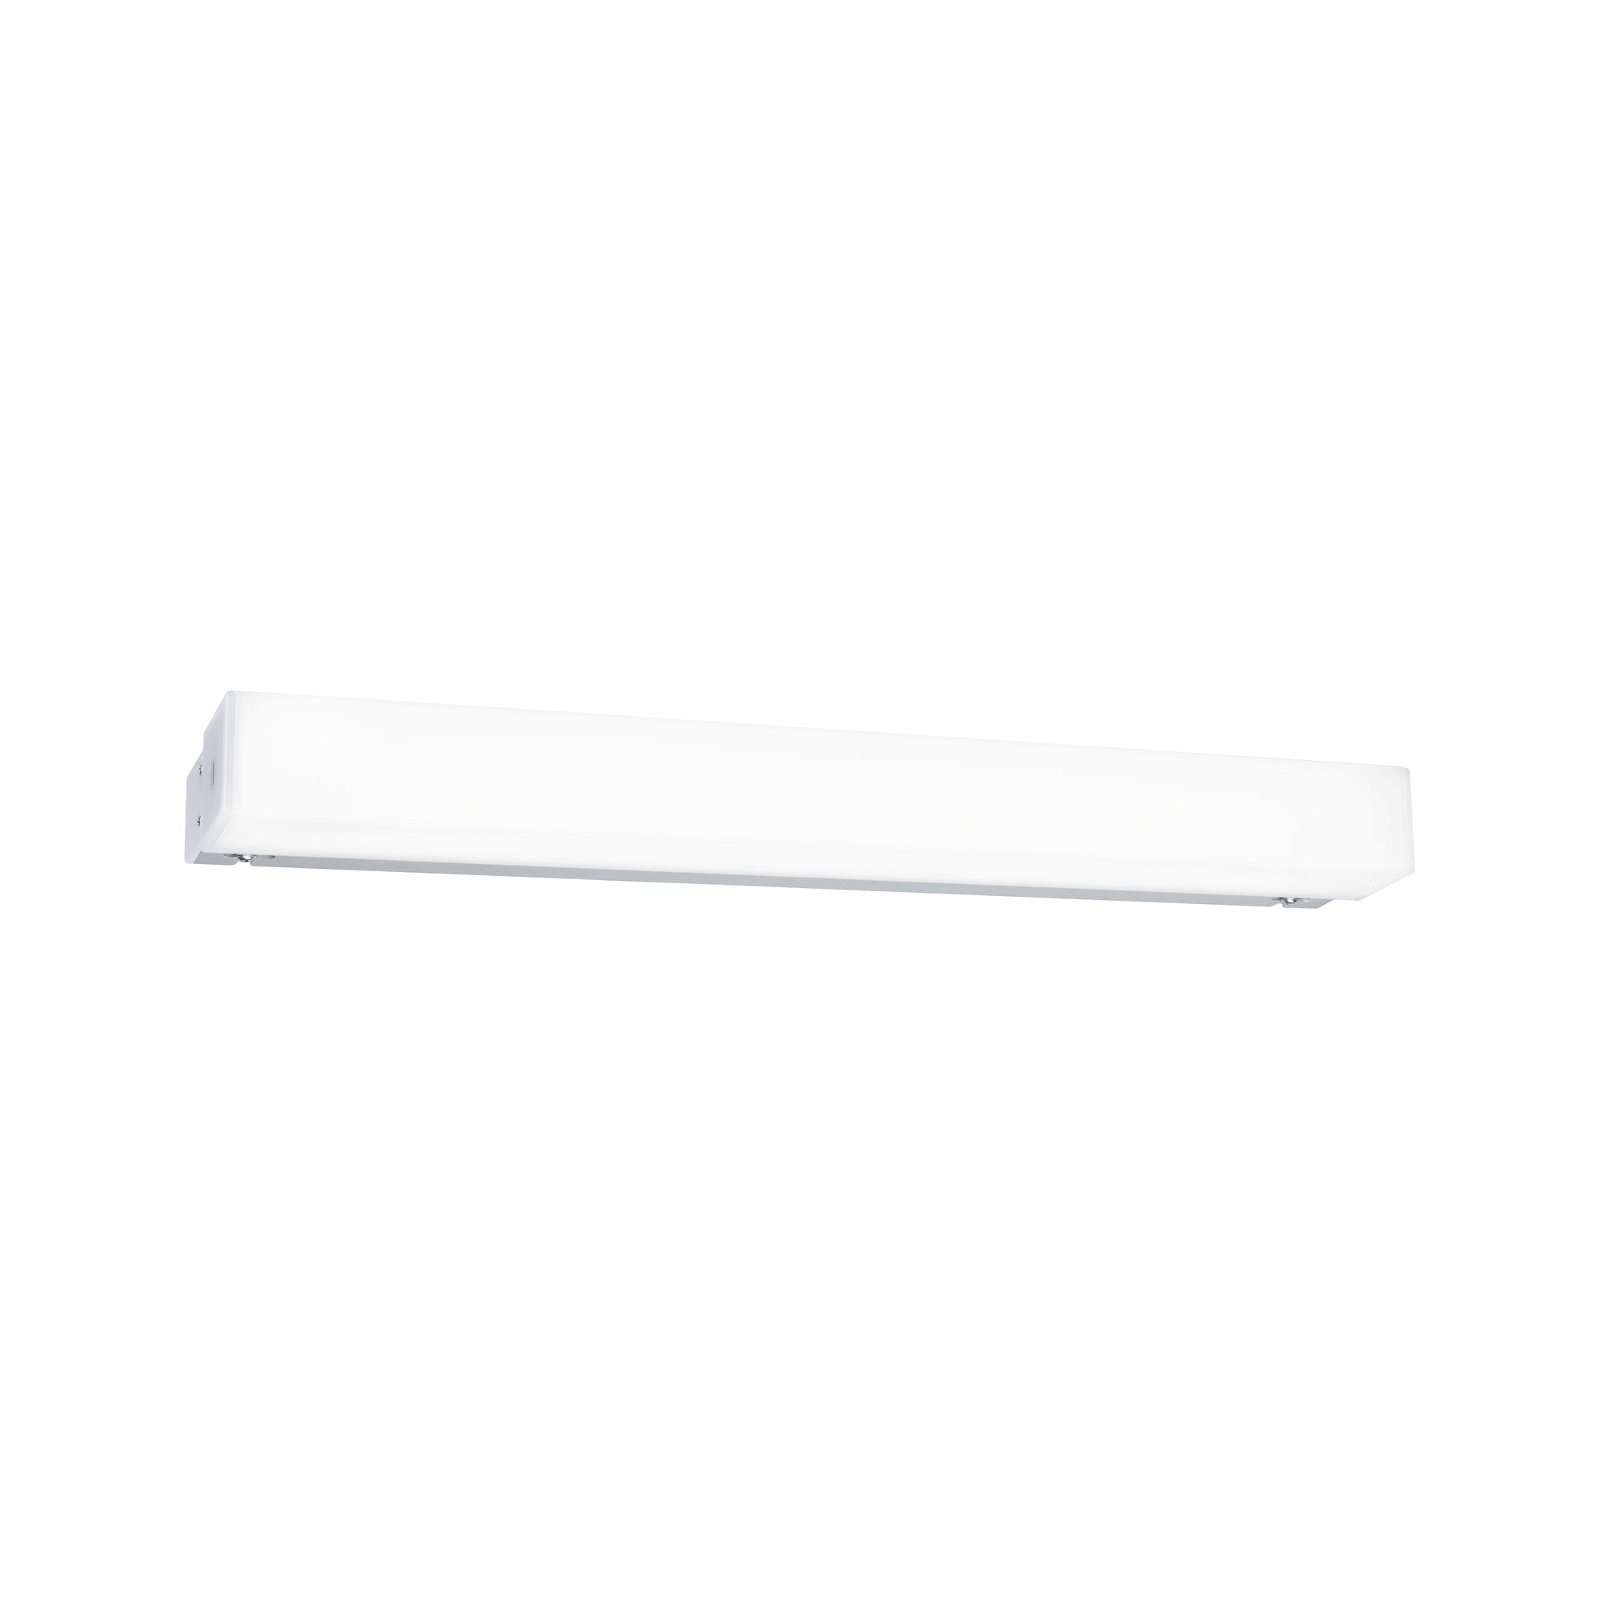 HomeSpa LED Spiegelleuchte Luno IP44 White Switch 670lm 230V 6W Alu